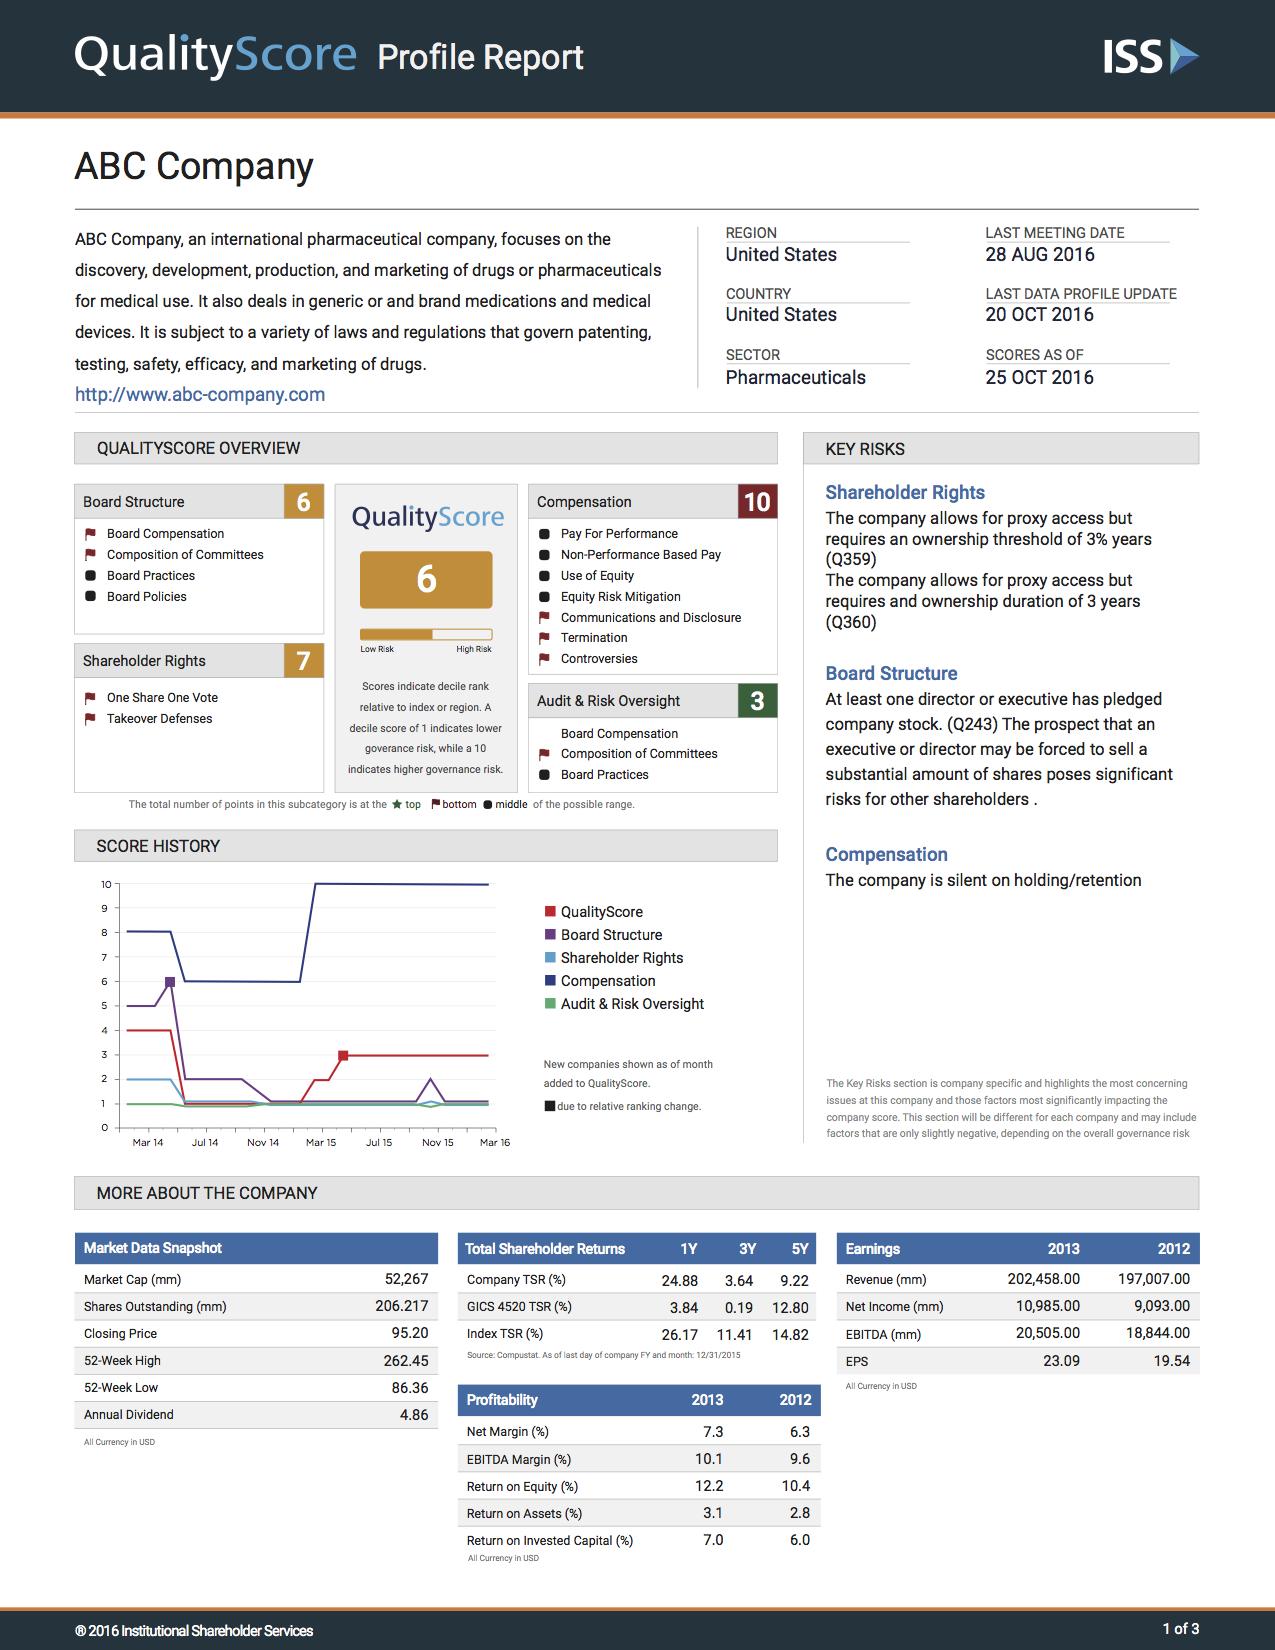 Sample QualityScore Report